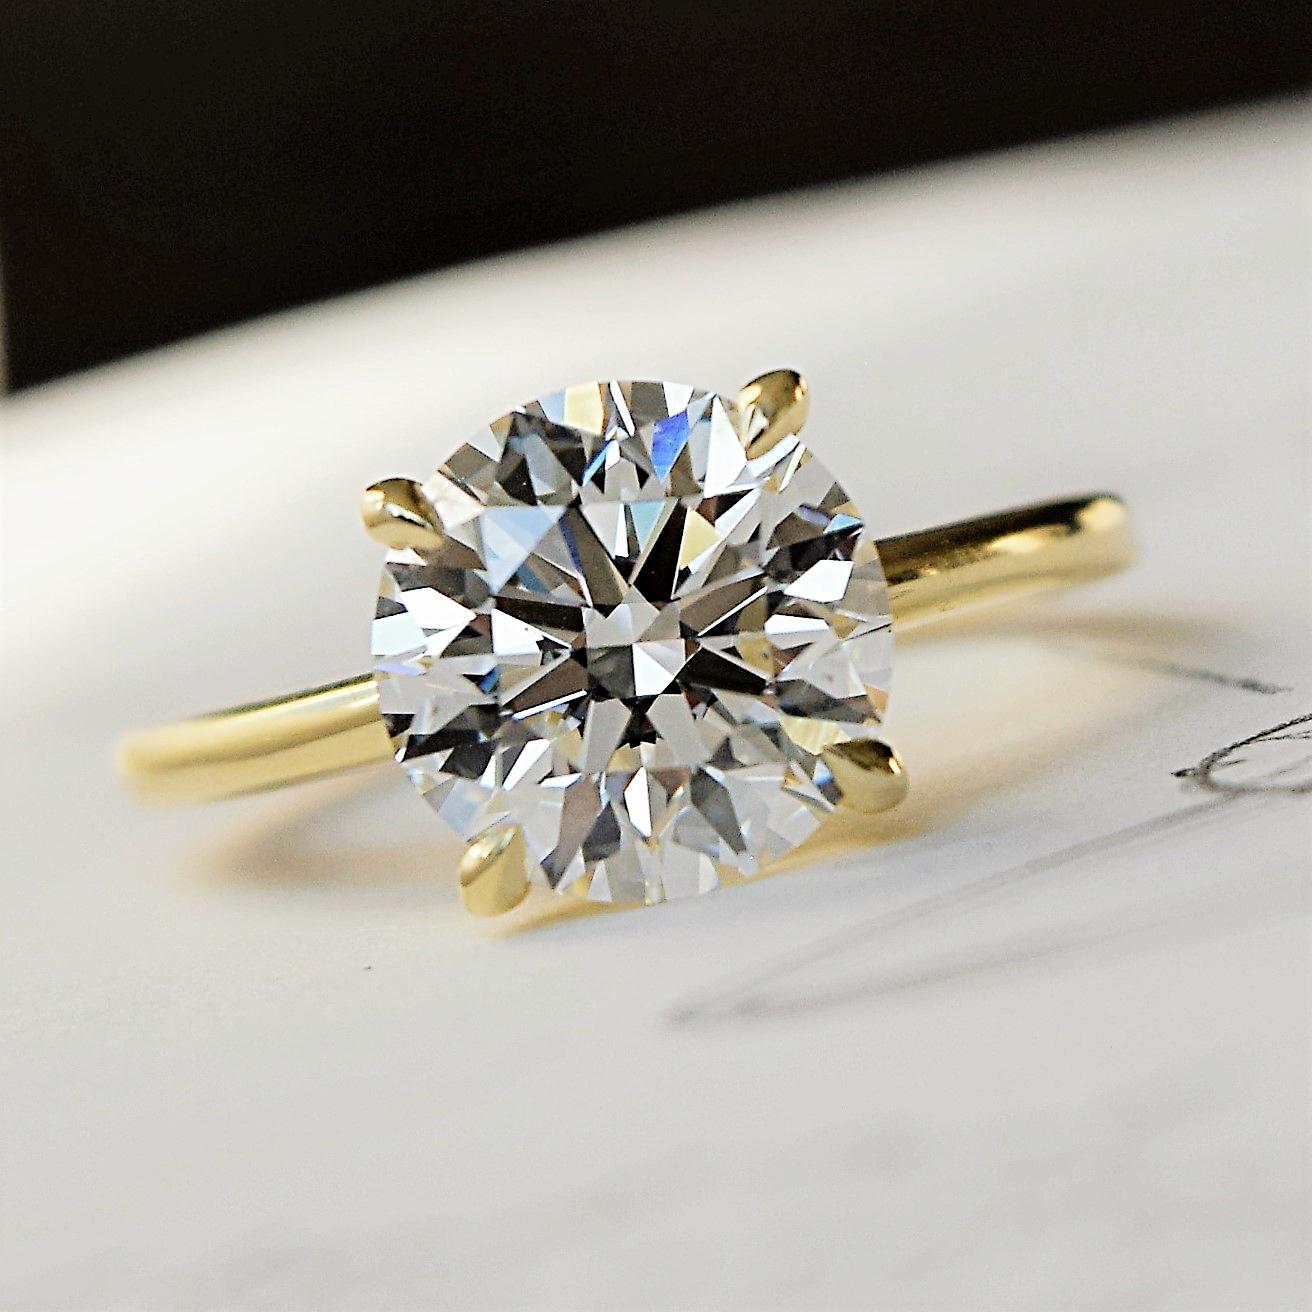 Round Brilliant Diamond in Classic Yellow Gold Setting